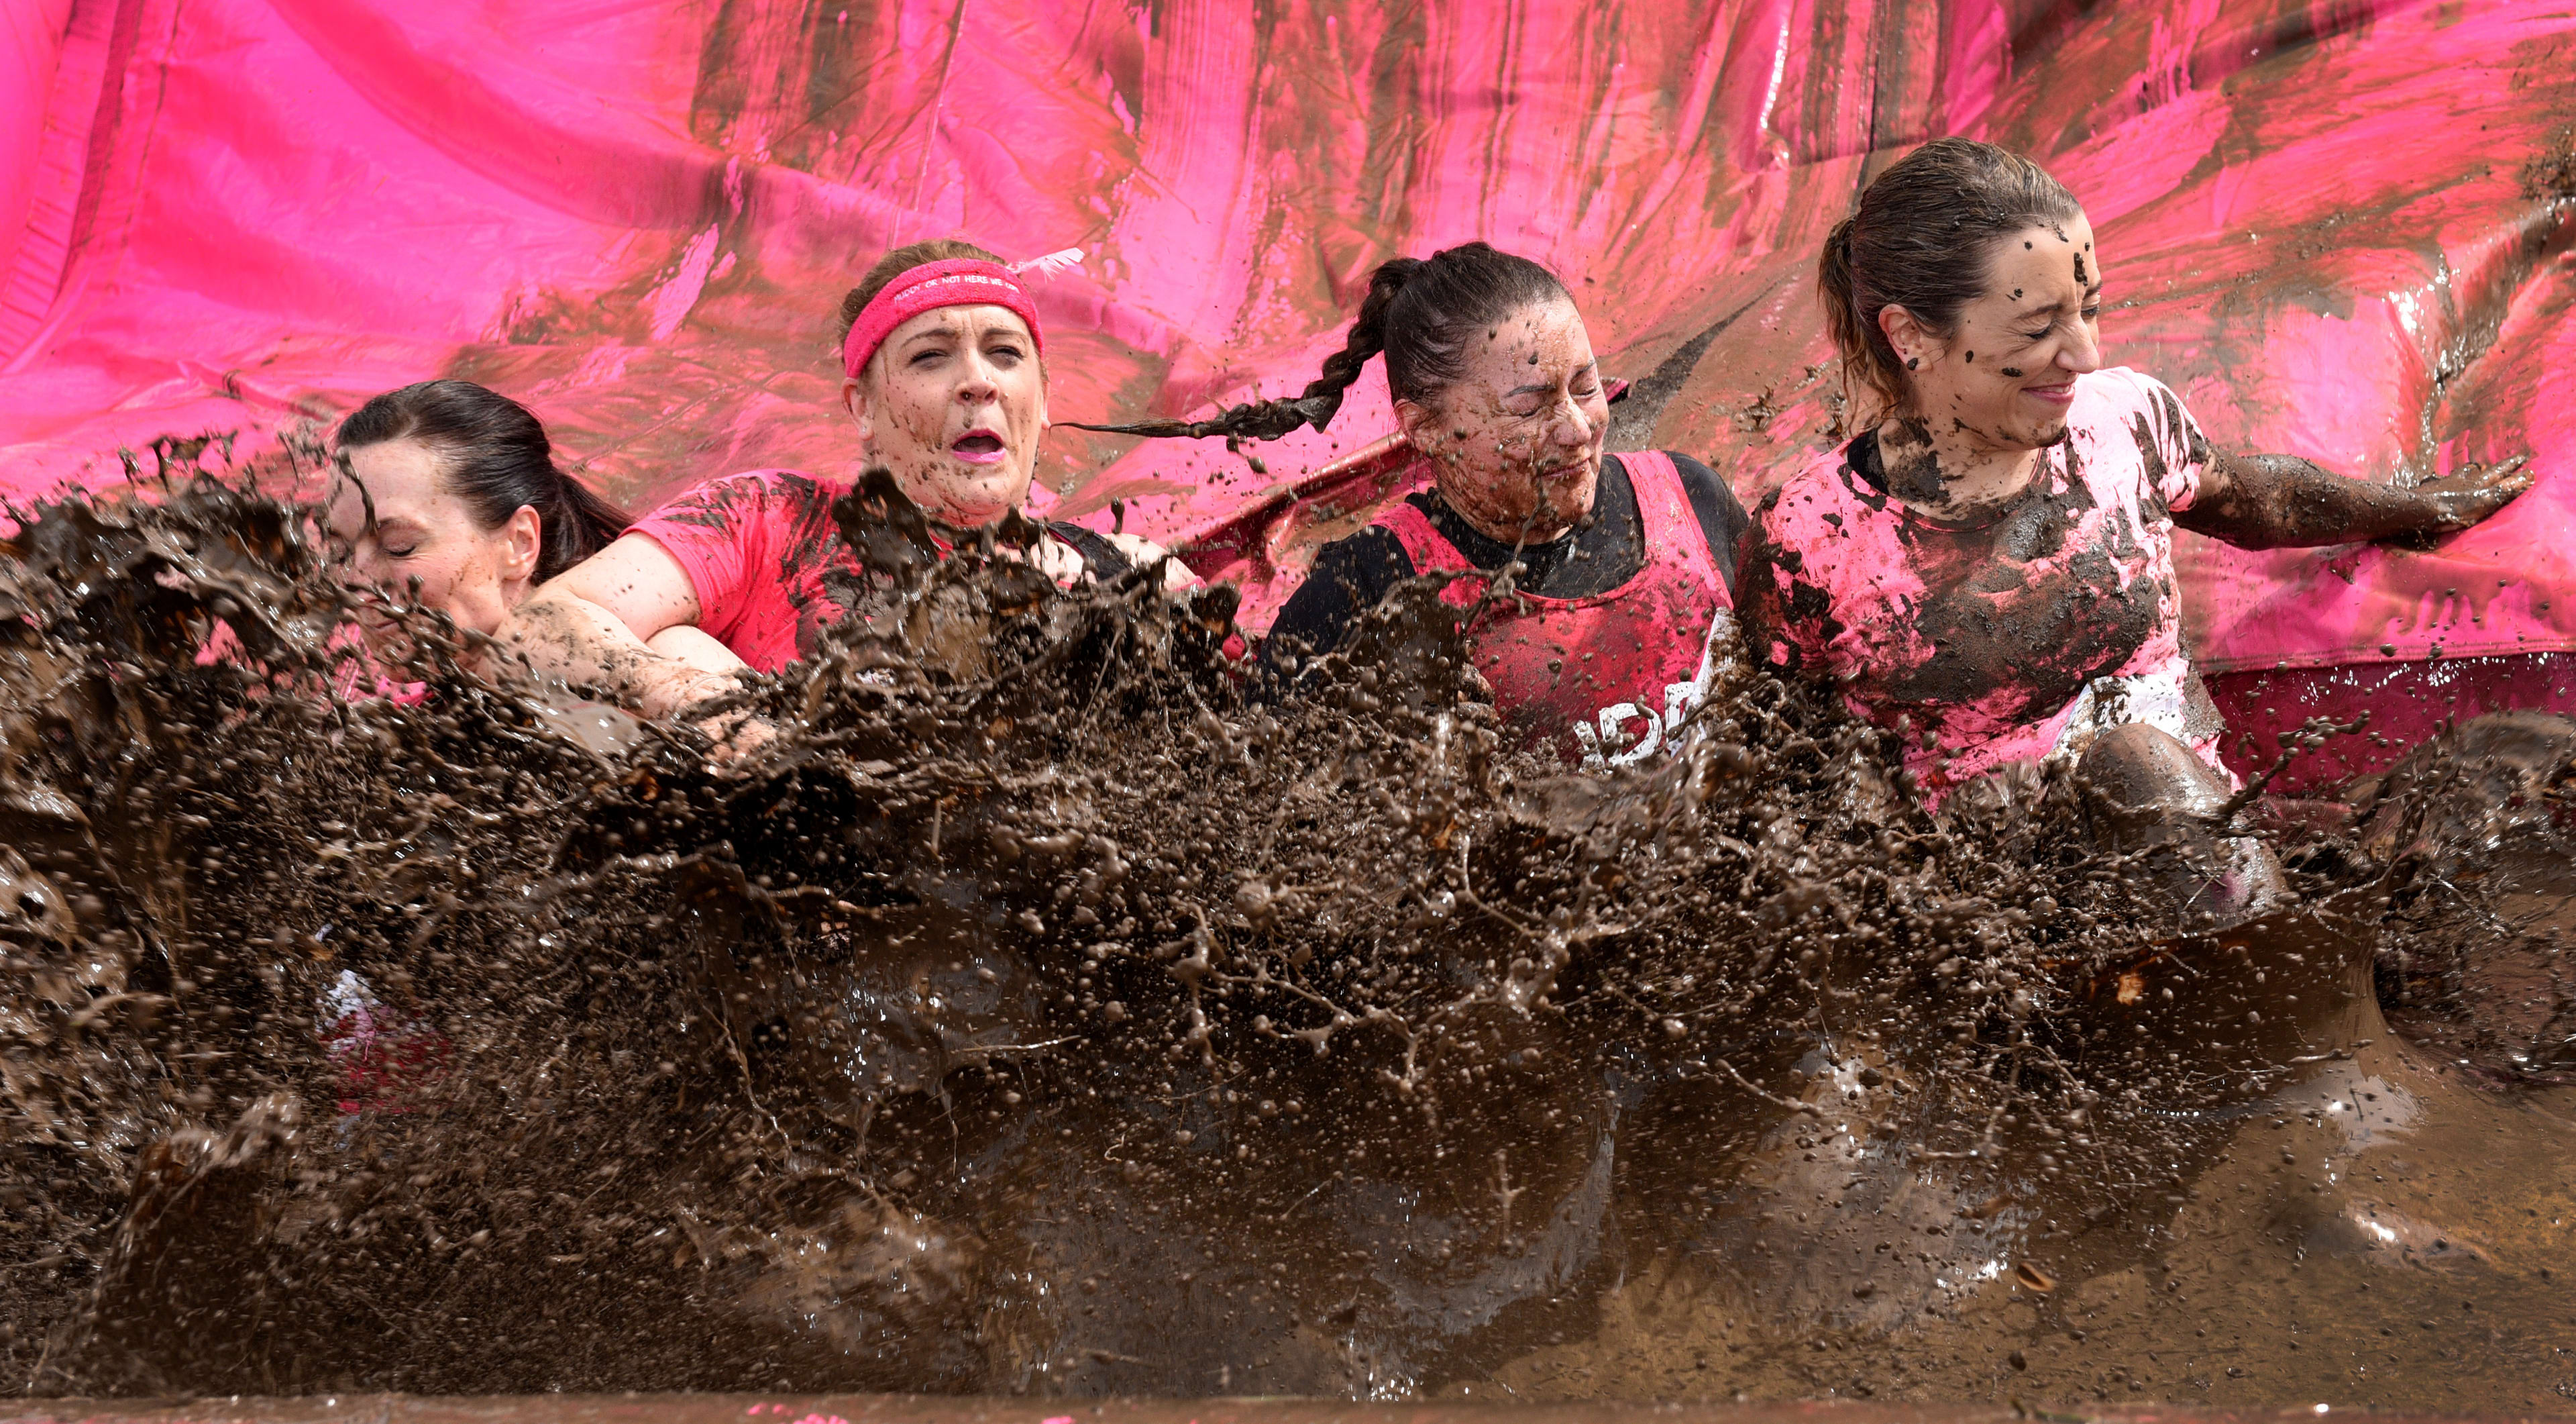 Pretty Muddy Race for Life Kids – Weston Park